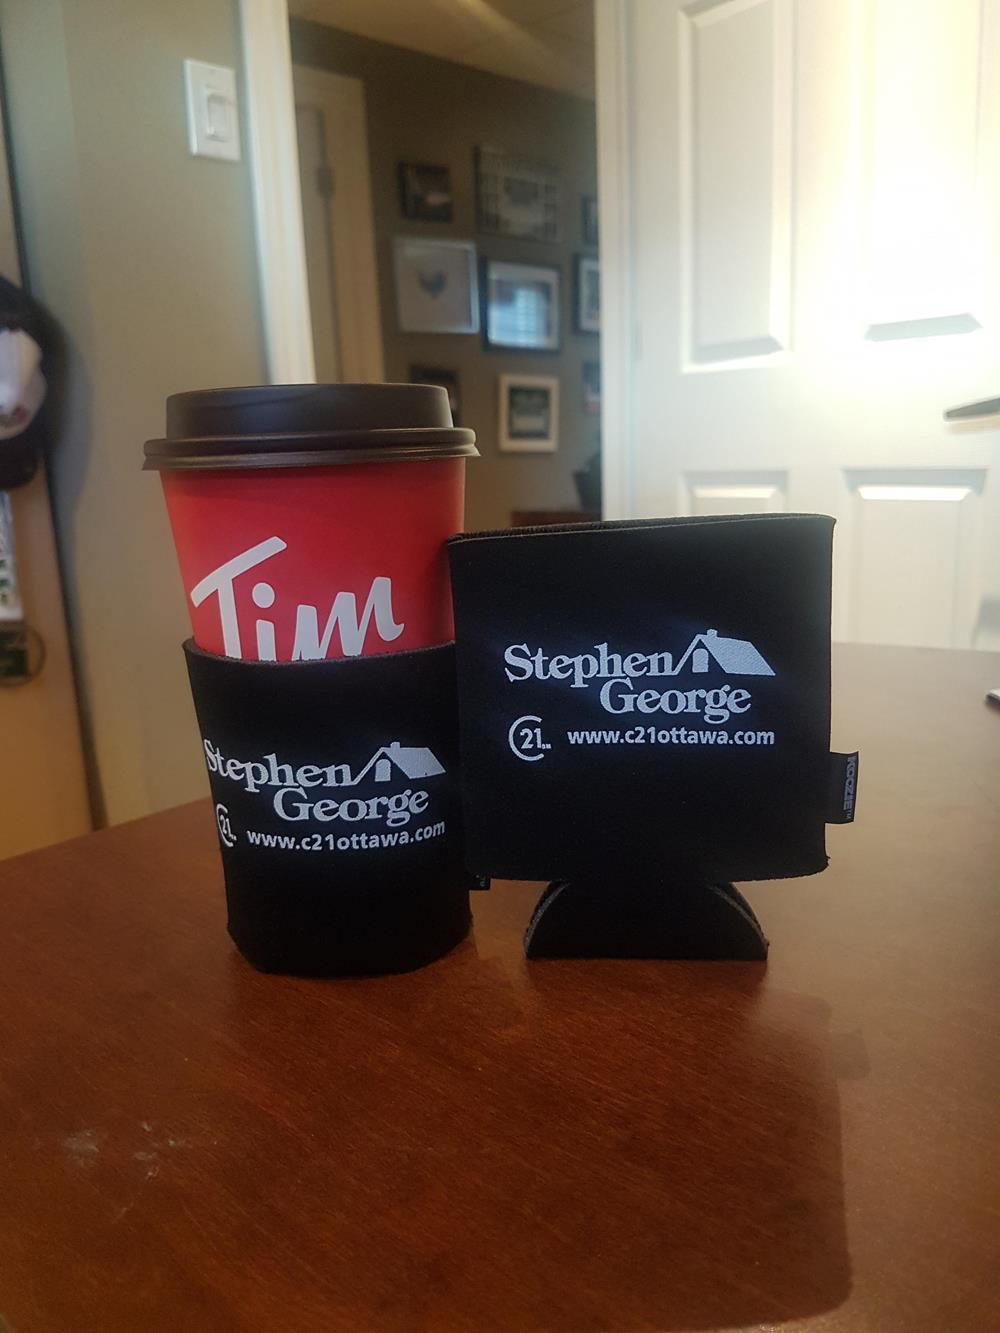 Customer photo from Stephen